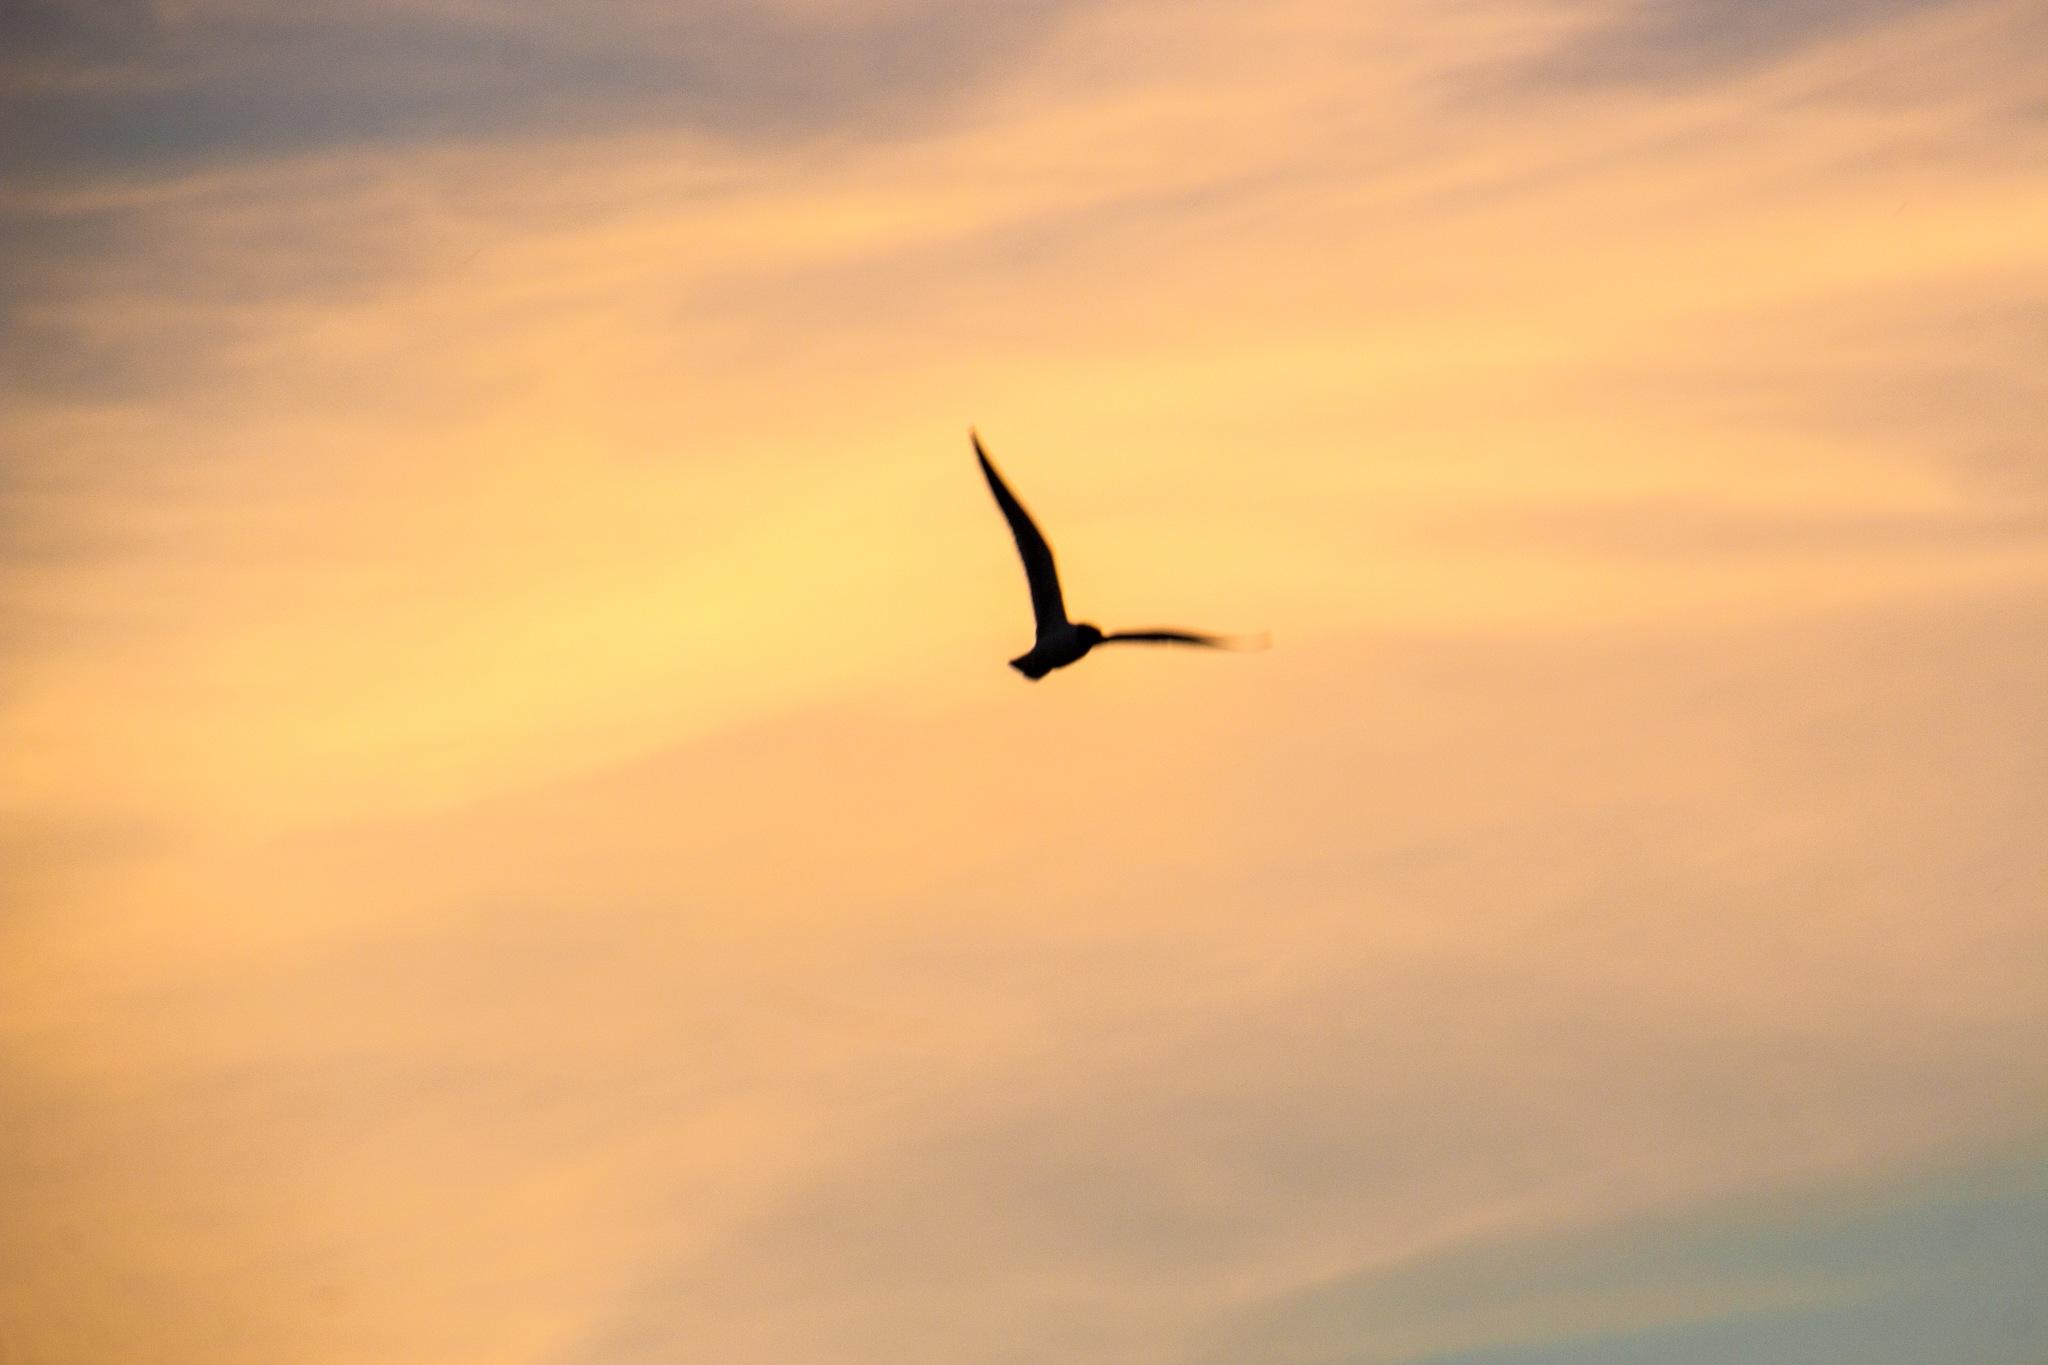 Wings of tomorrow by Carl Hult